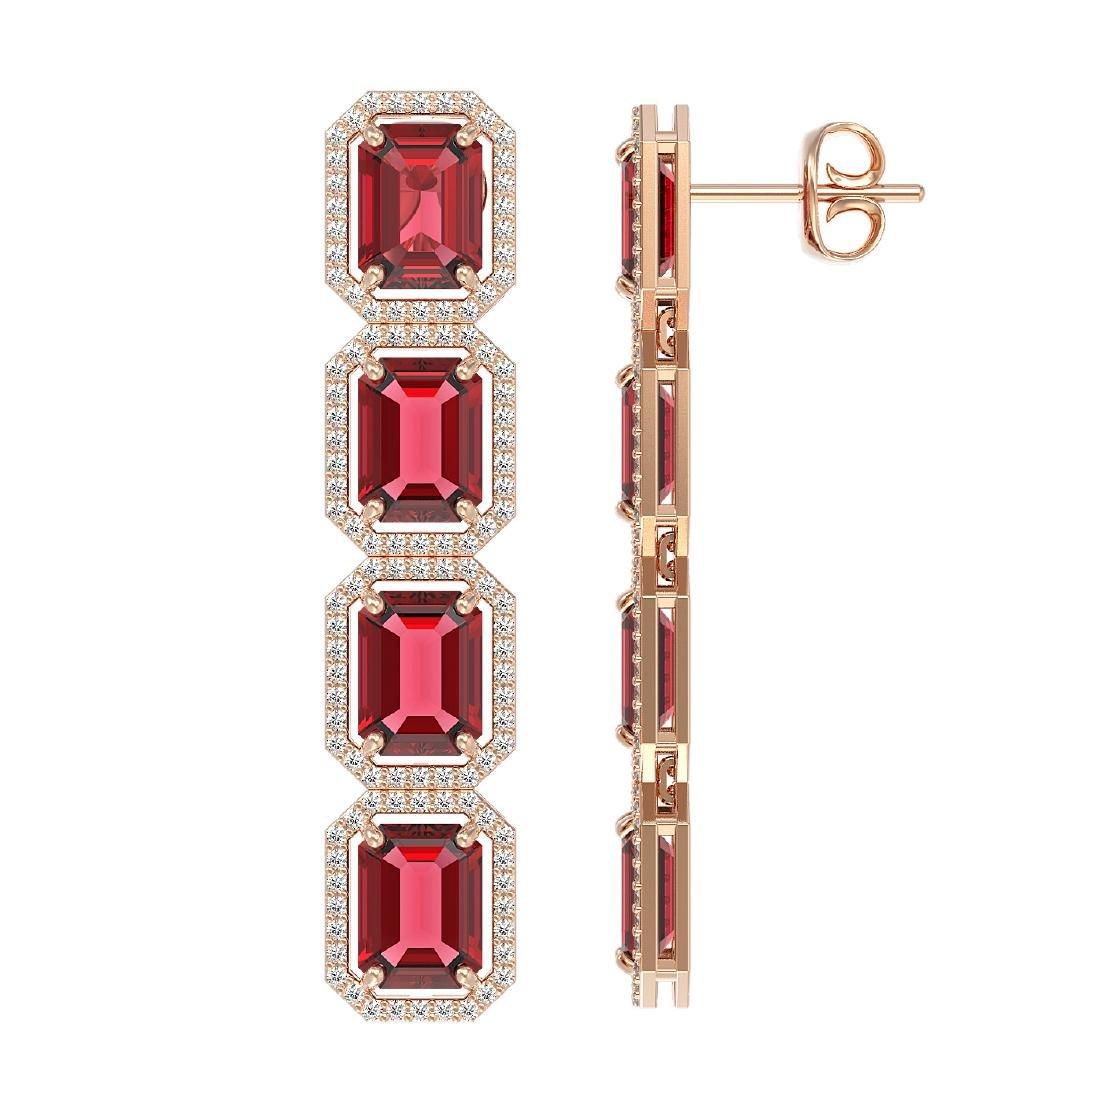 19.44 CTW Tourmaline & Diamond Halo Earrings 10K Rose - 2